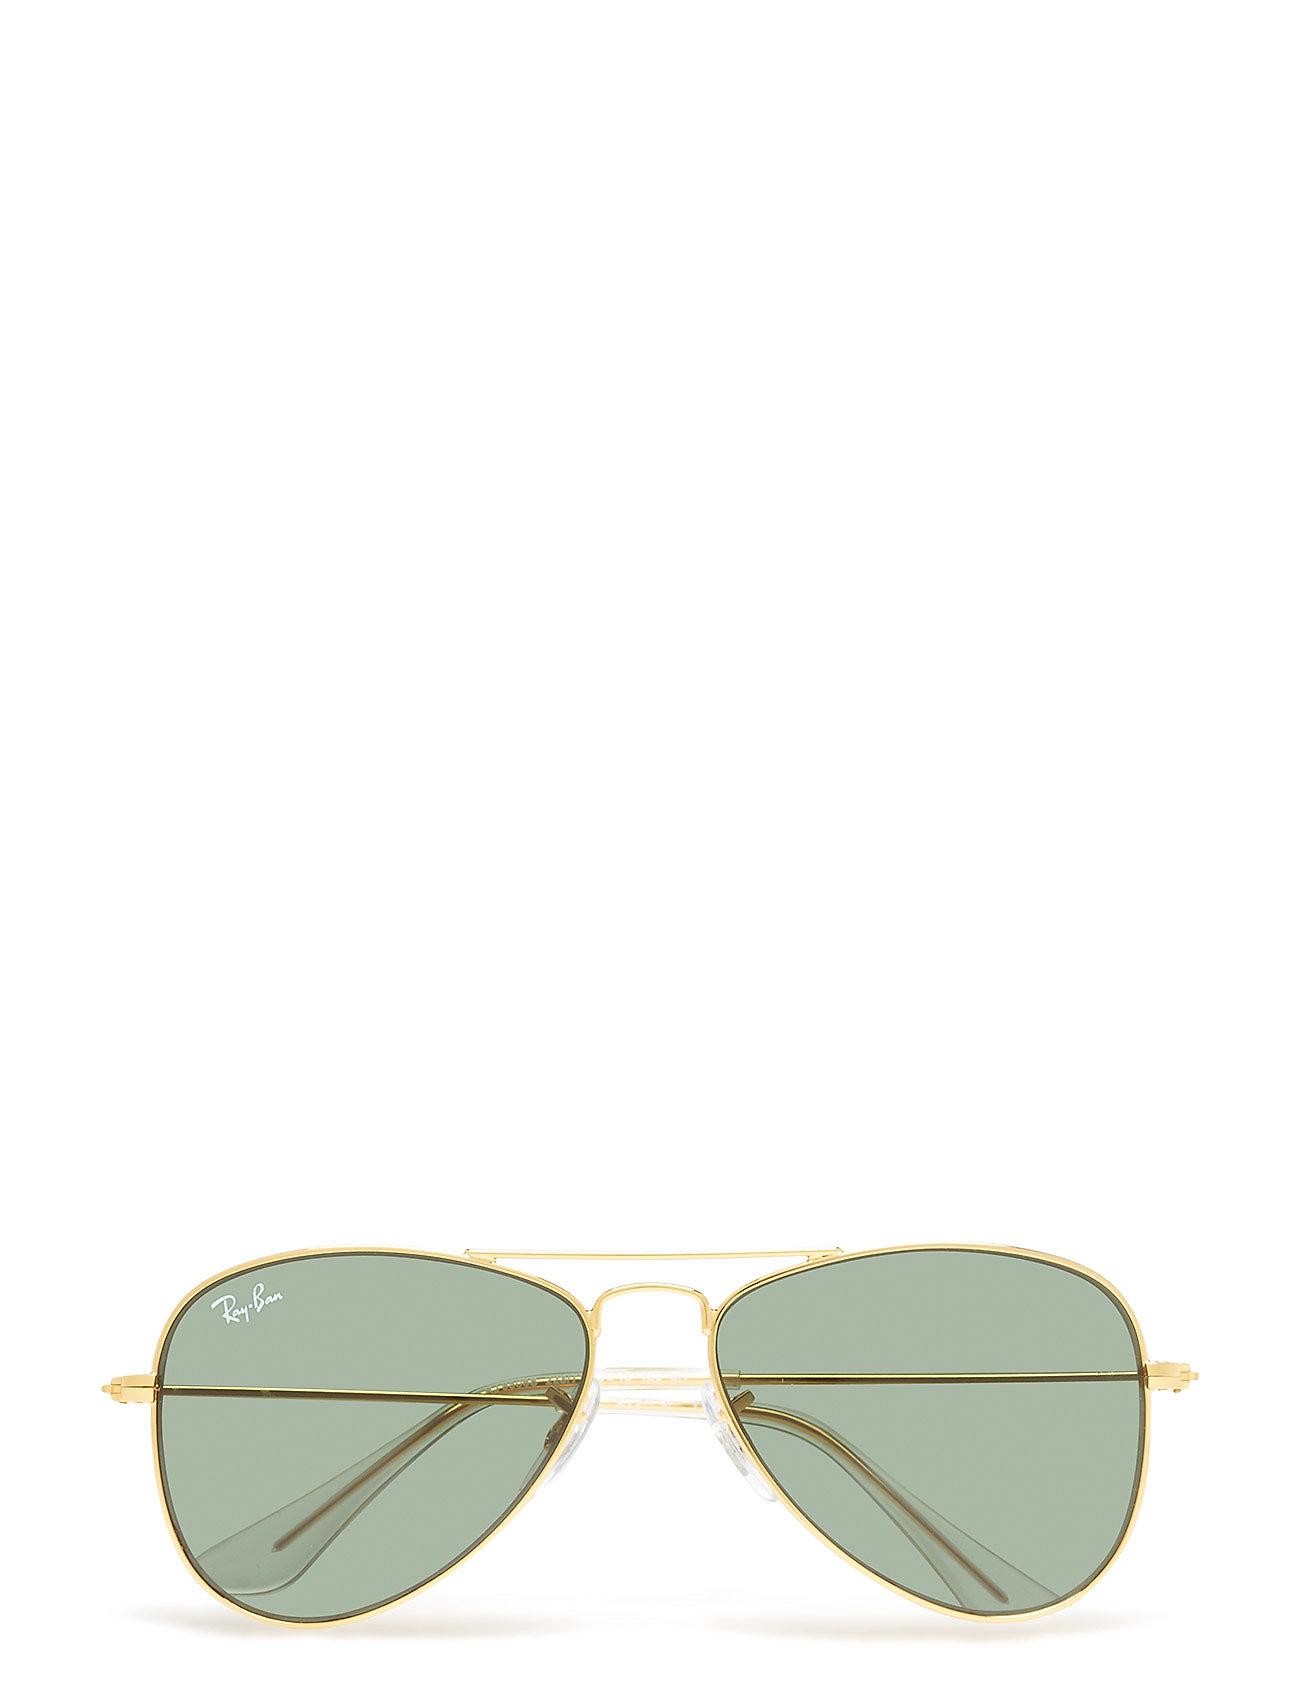 fcc7397036 Aviator Junior (Gold-green) (£60) - Ray-Ban -